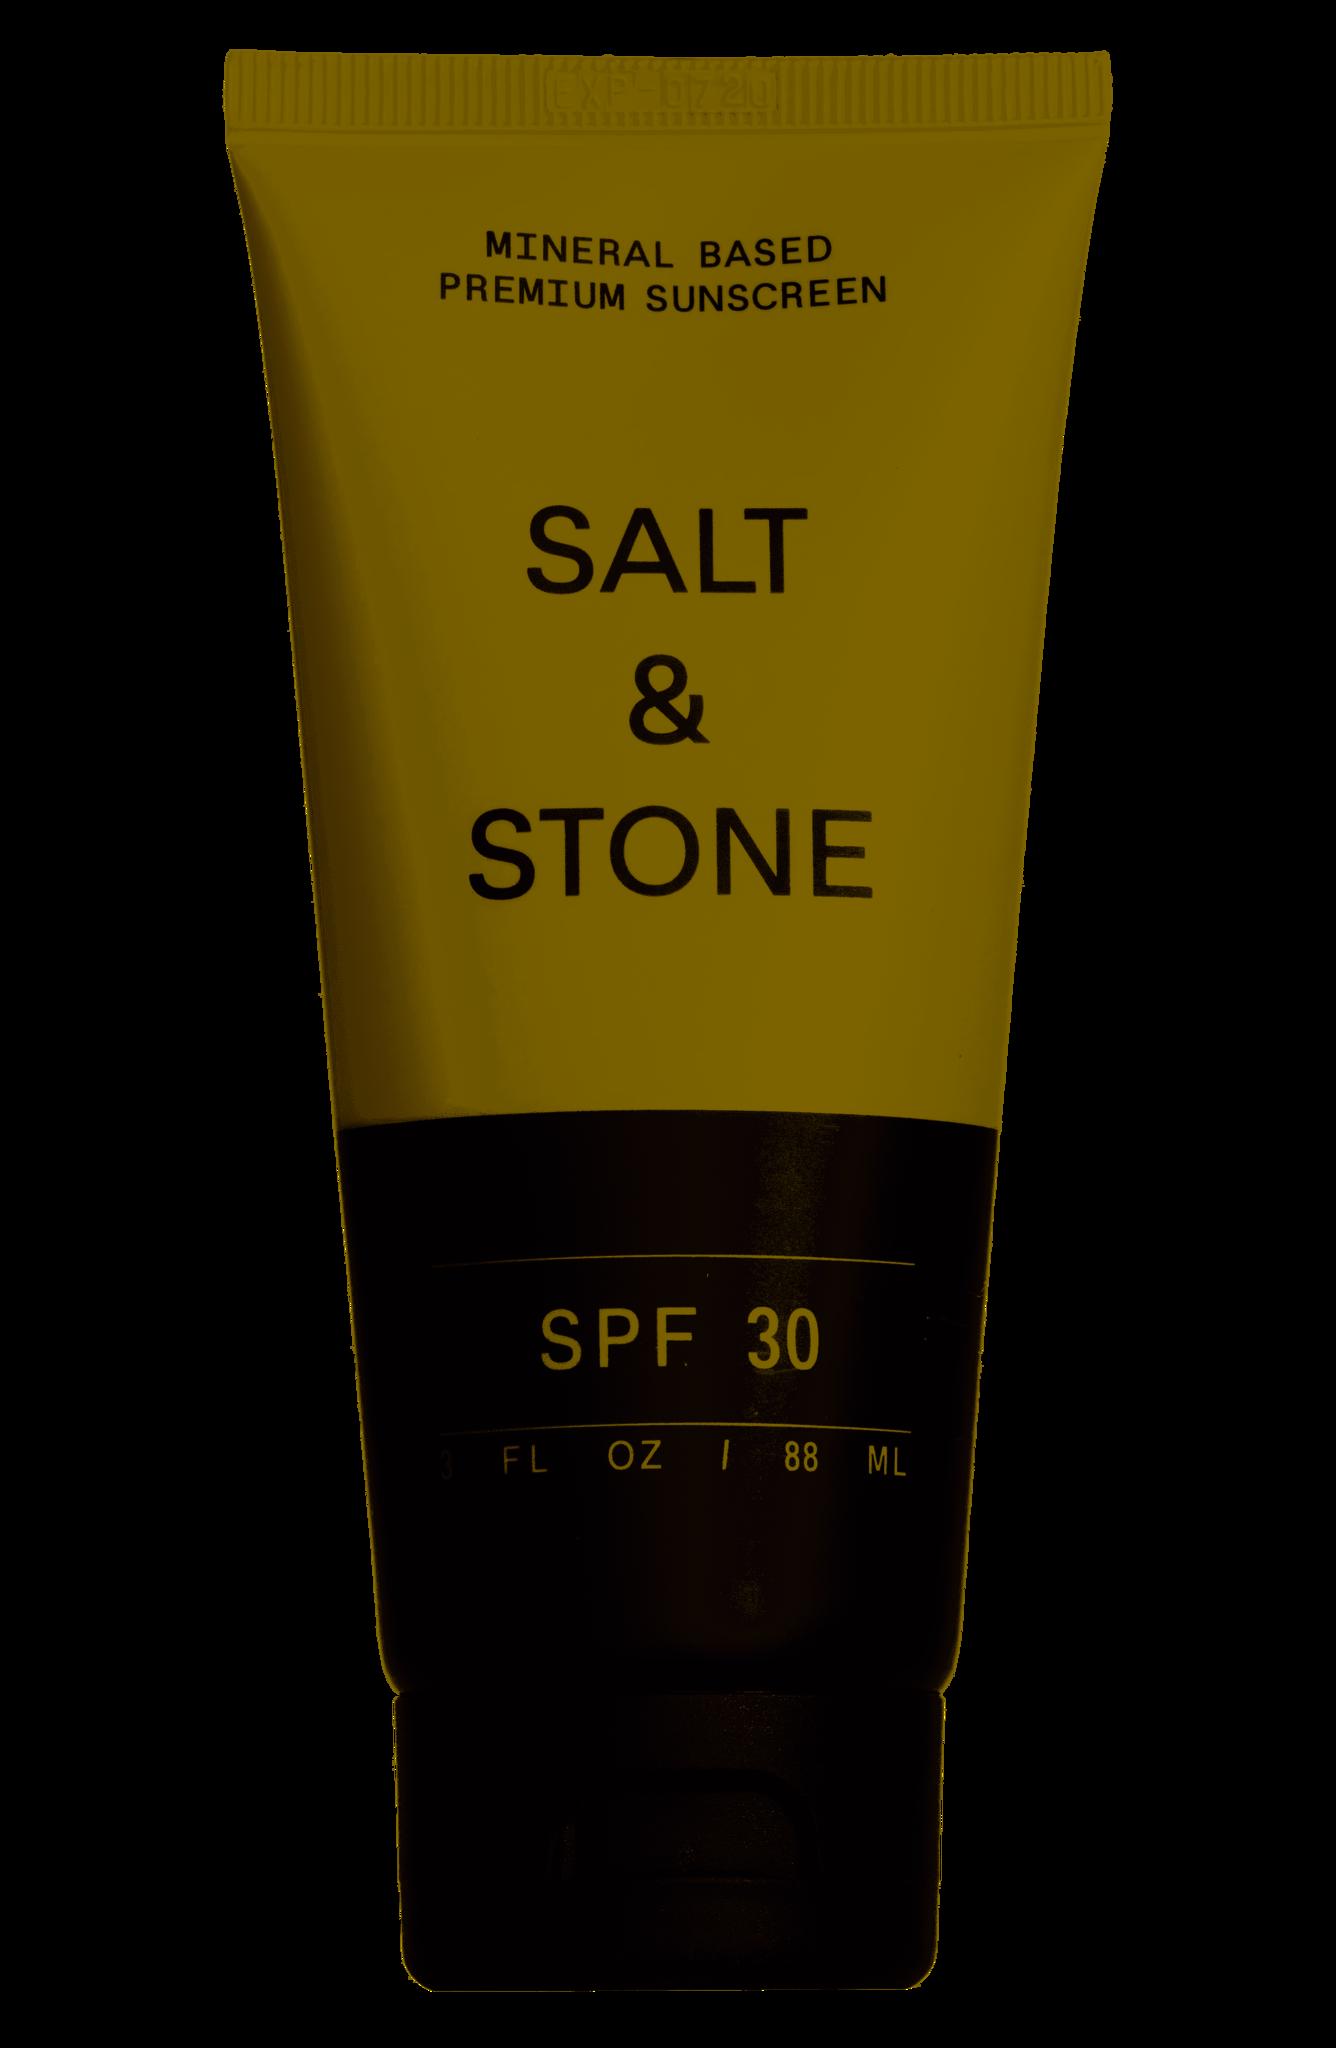 SALT & STONE SALT & STONE SPF 30 LOTION